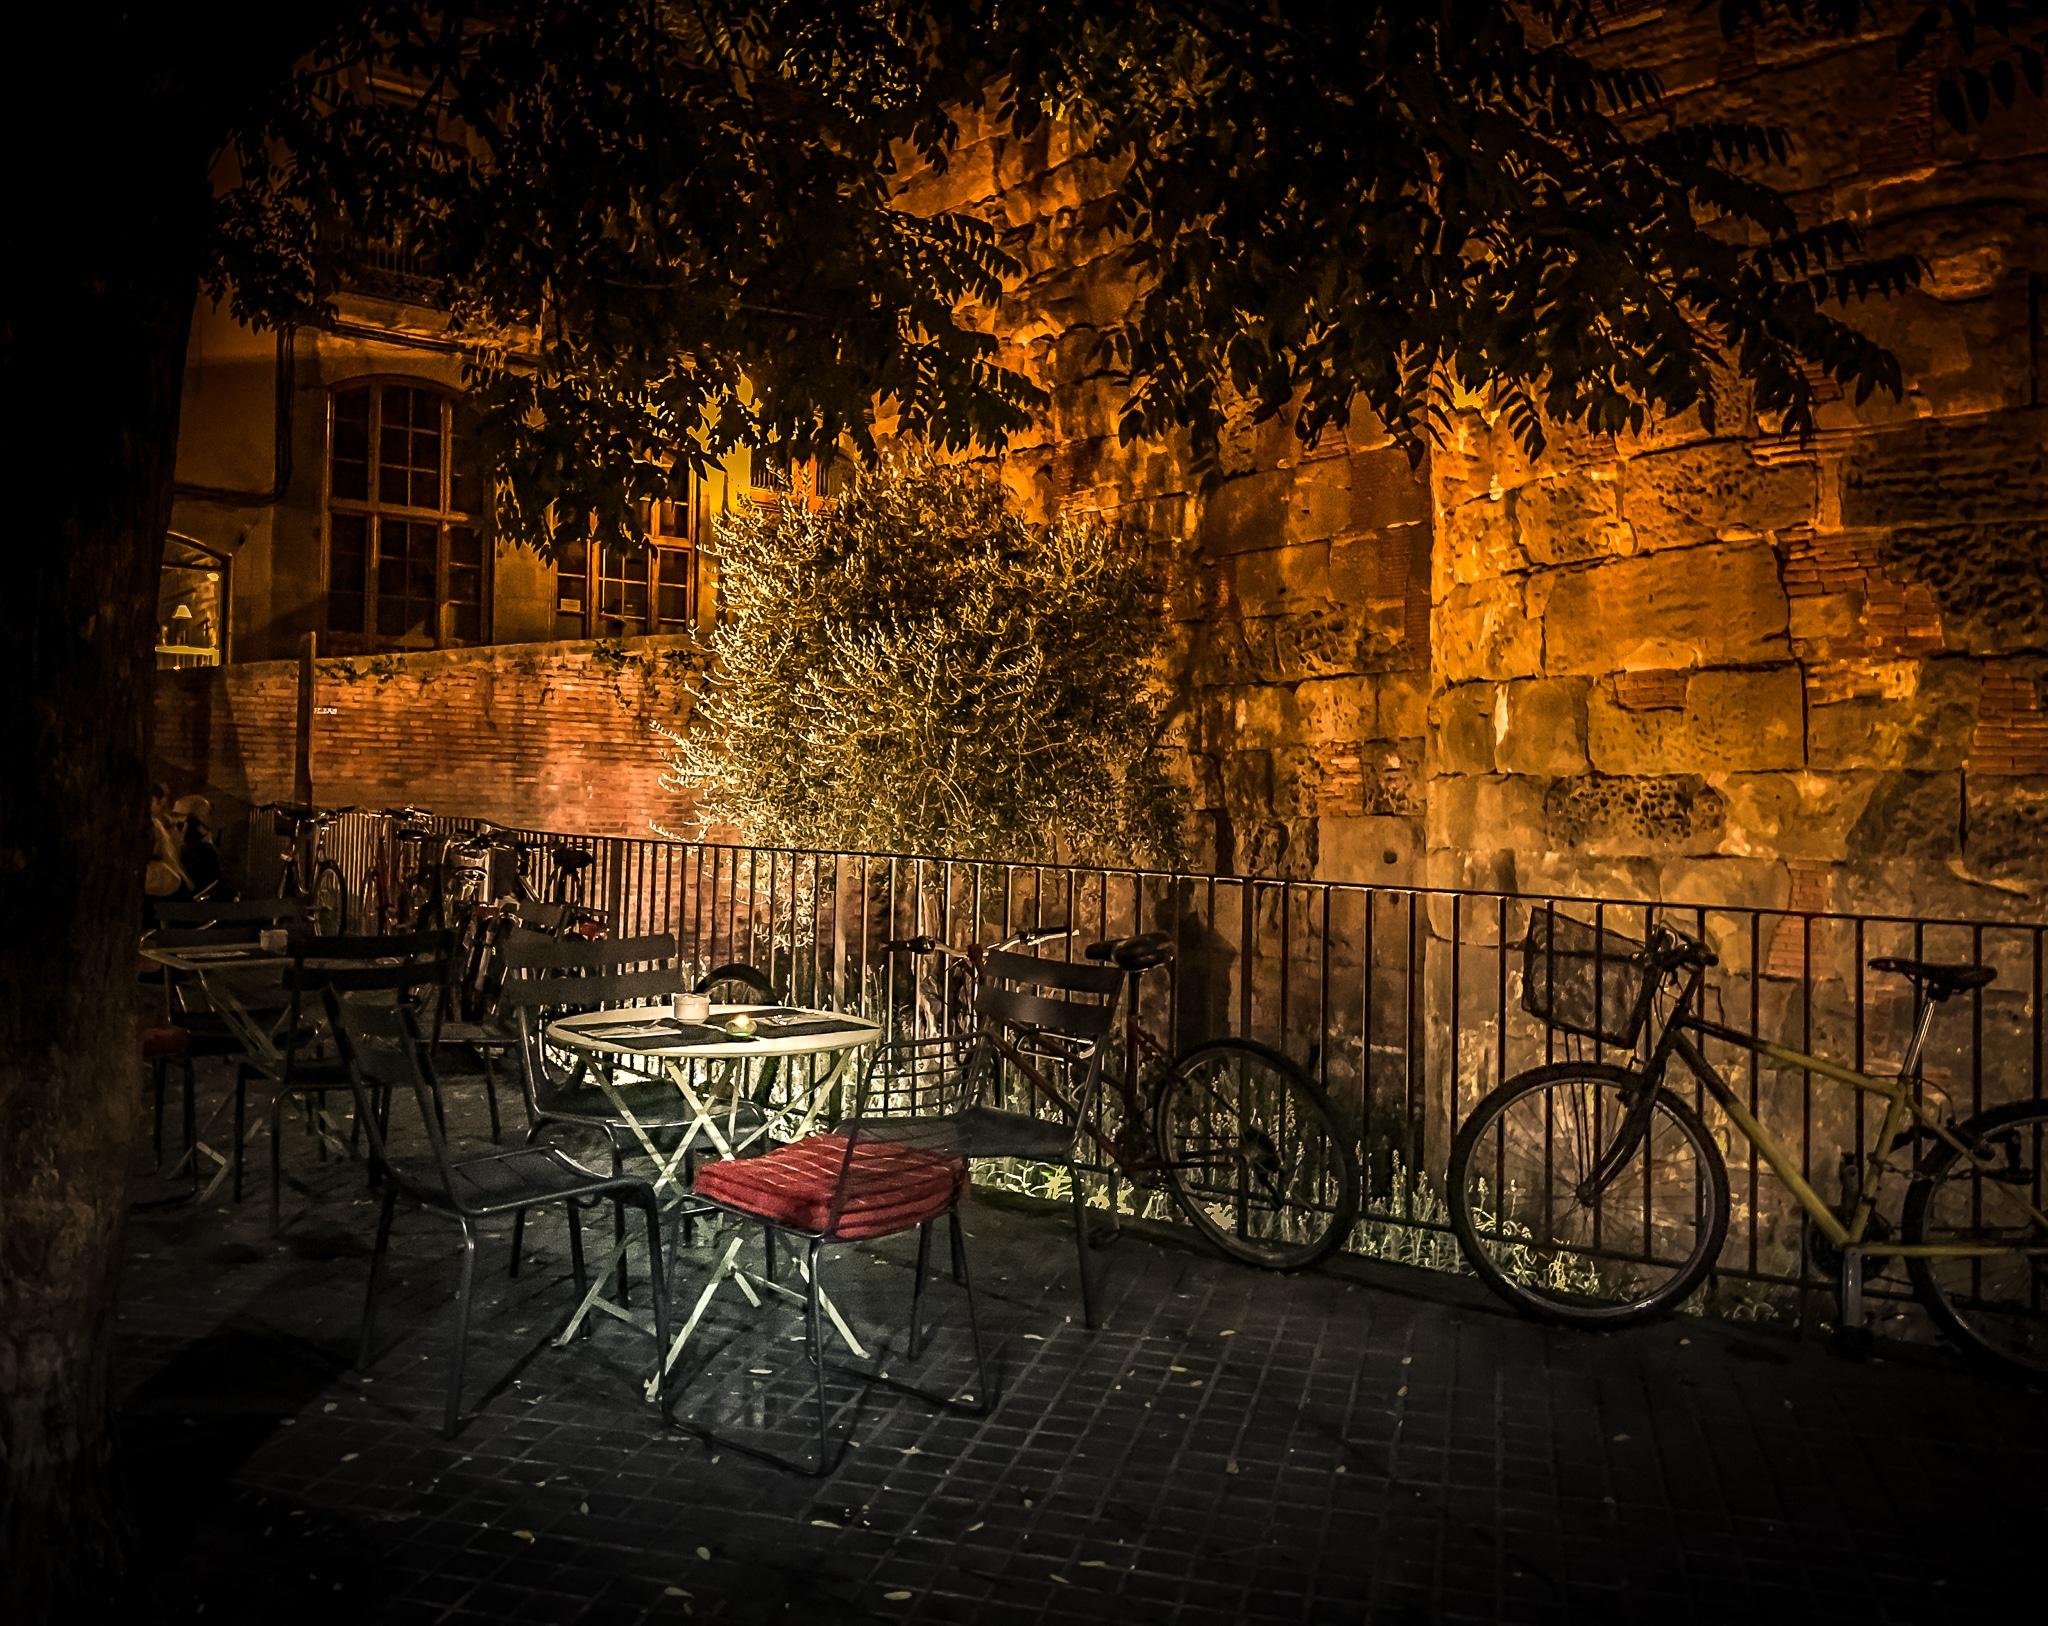 Empty Seat in Spotlight ©HelenBushe